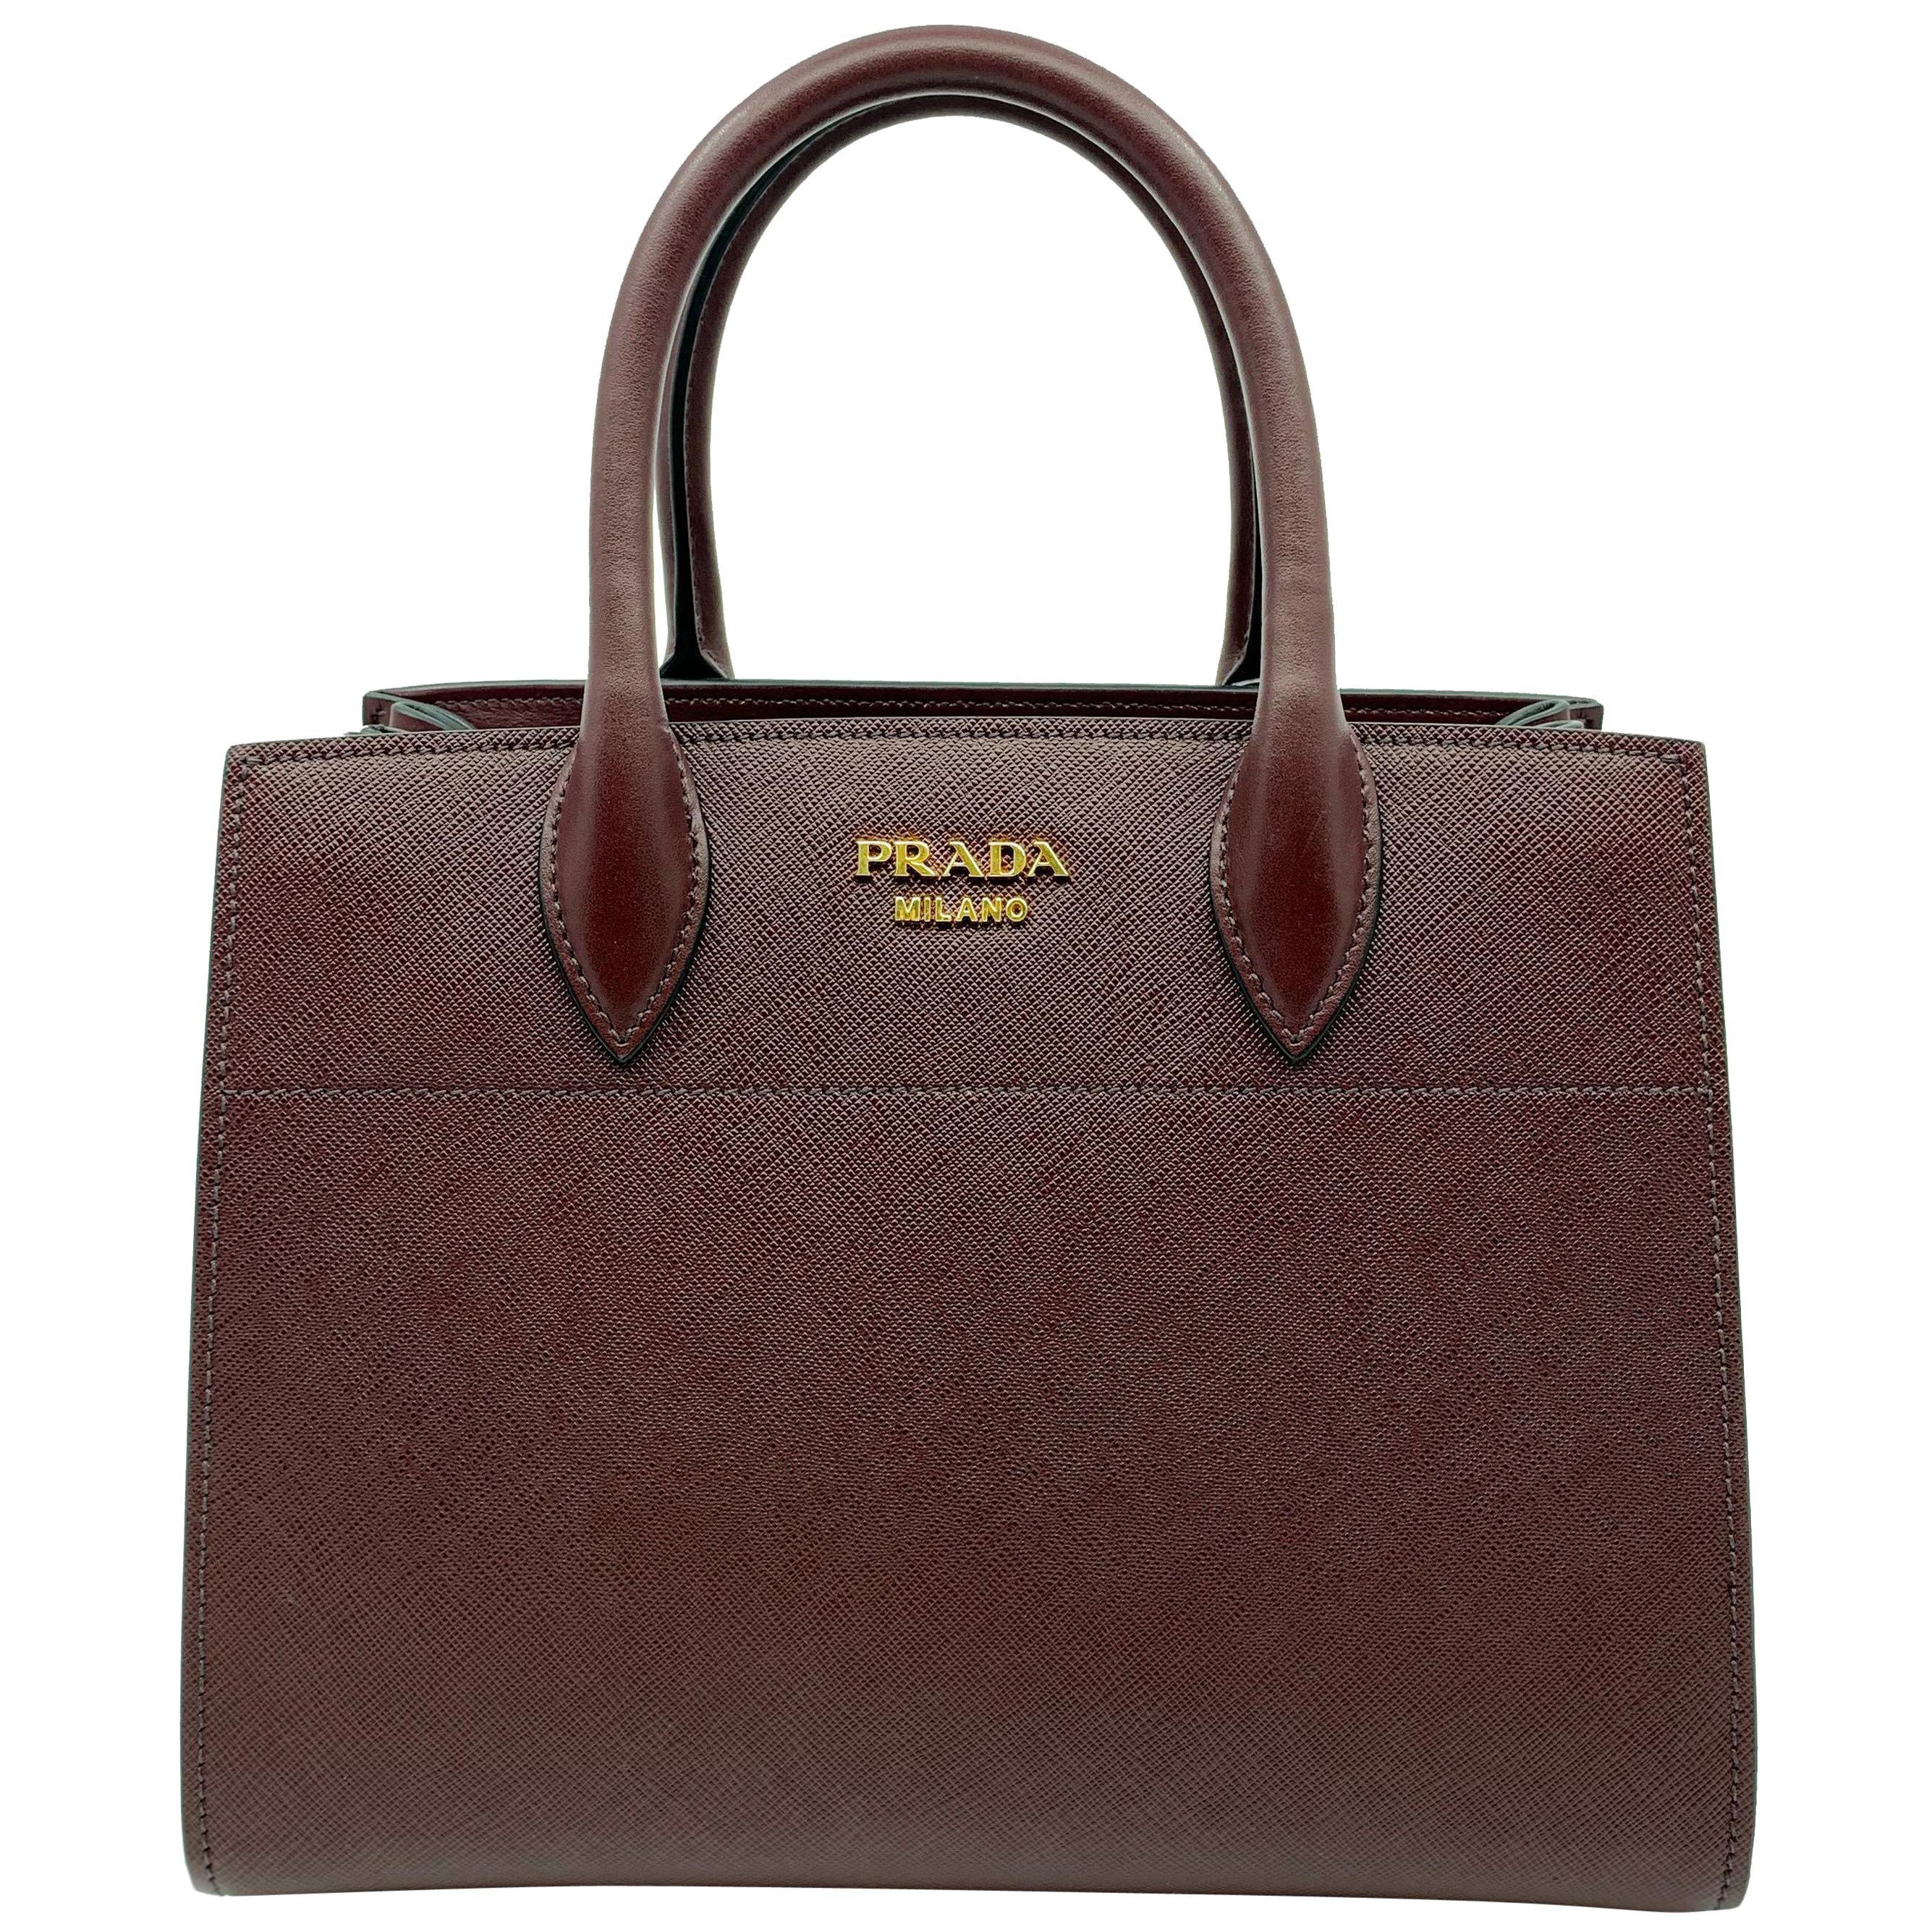 79283ee636bb Vintage Prada Handbags and Purses - 1